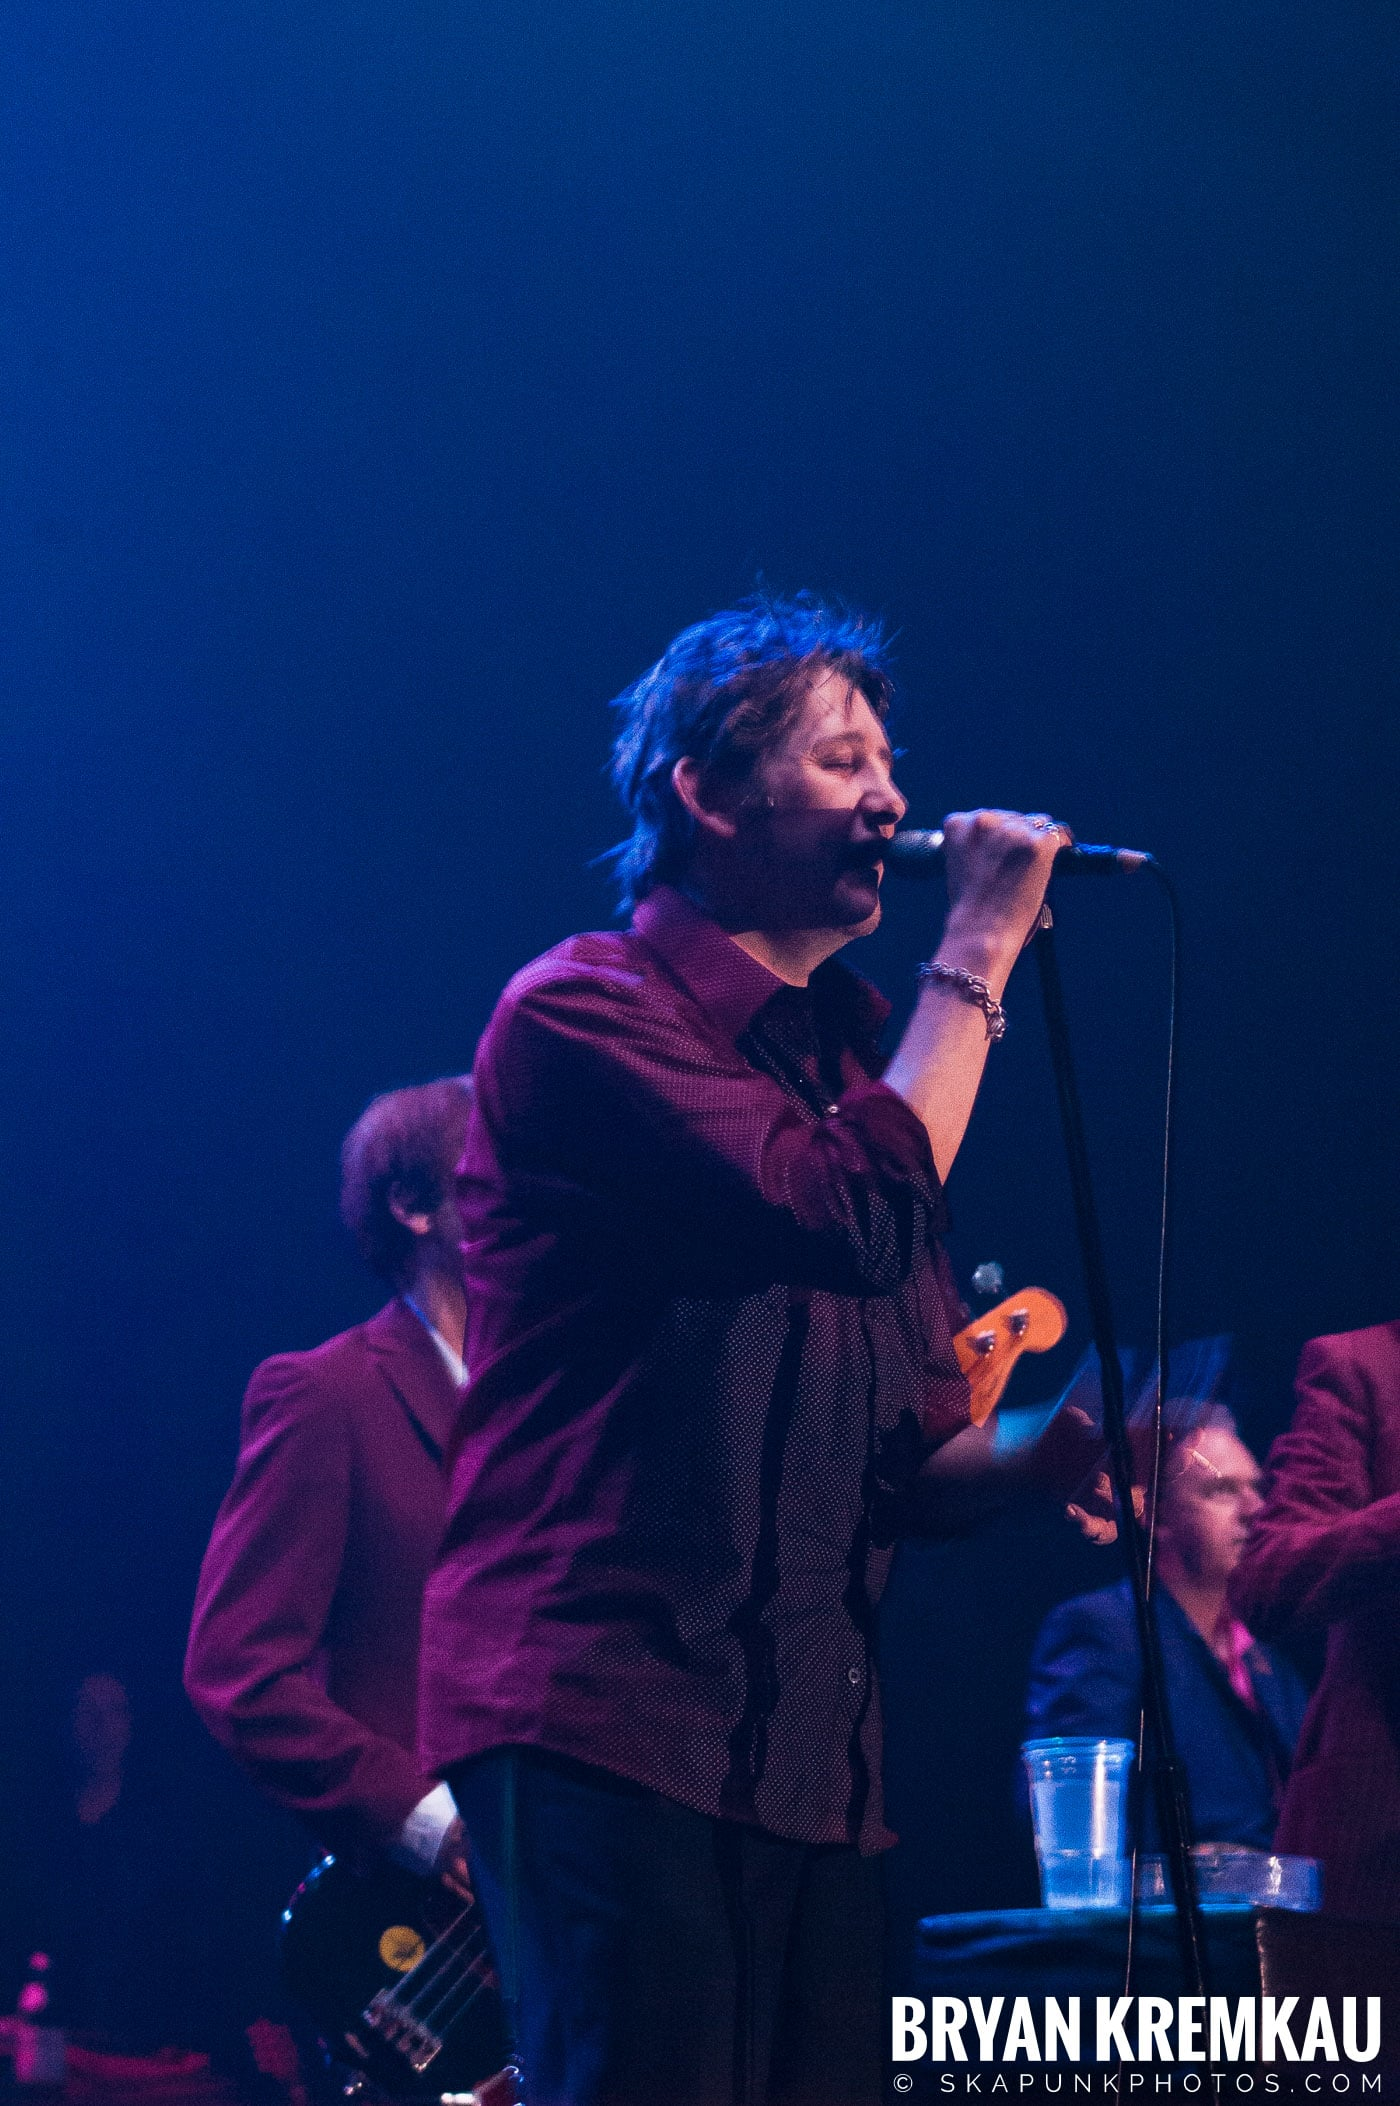 The Pogues @ Brixton Academy, London UK - 12.17.06 (8)